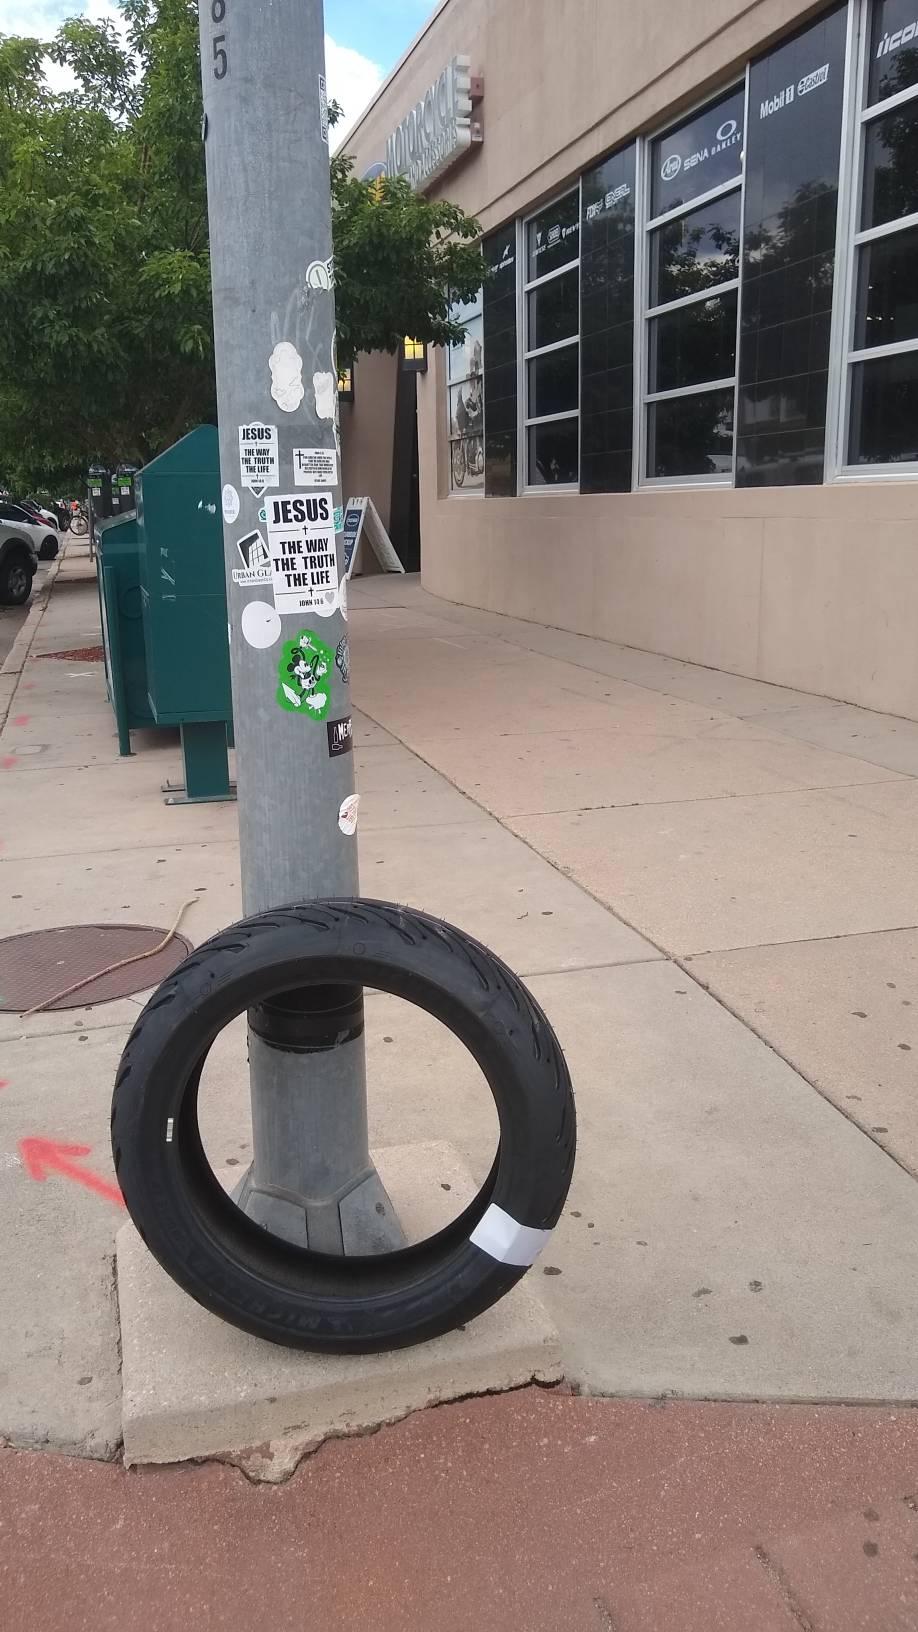 2021-06-07 New tire .jpg